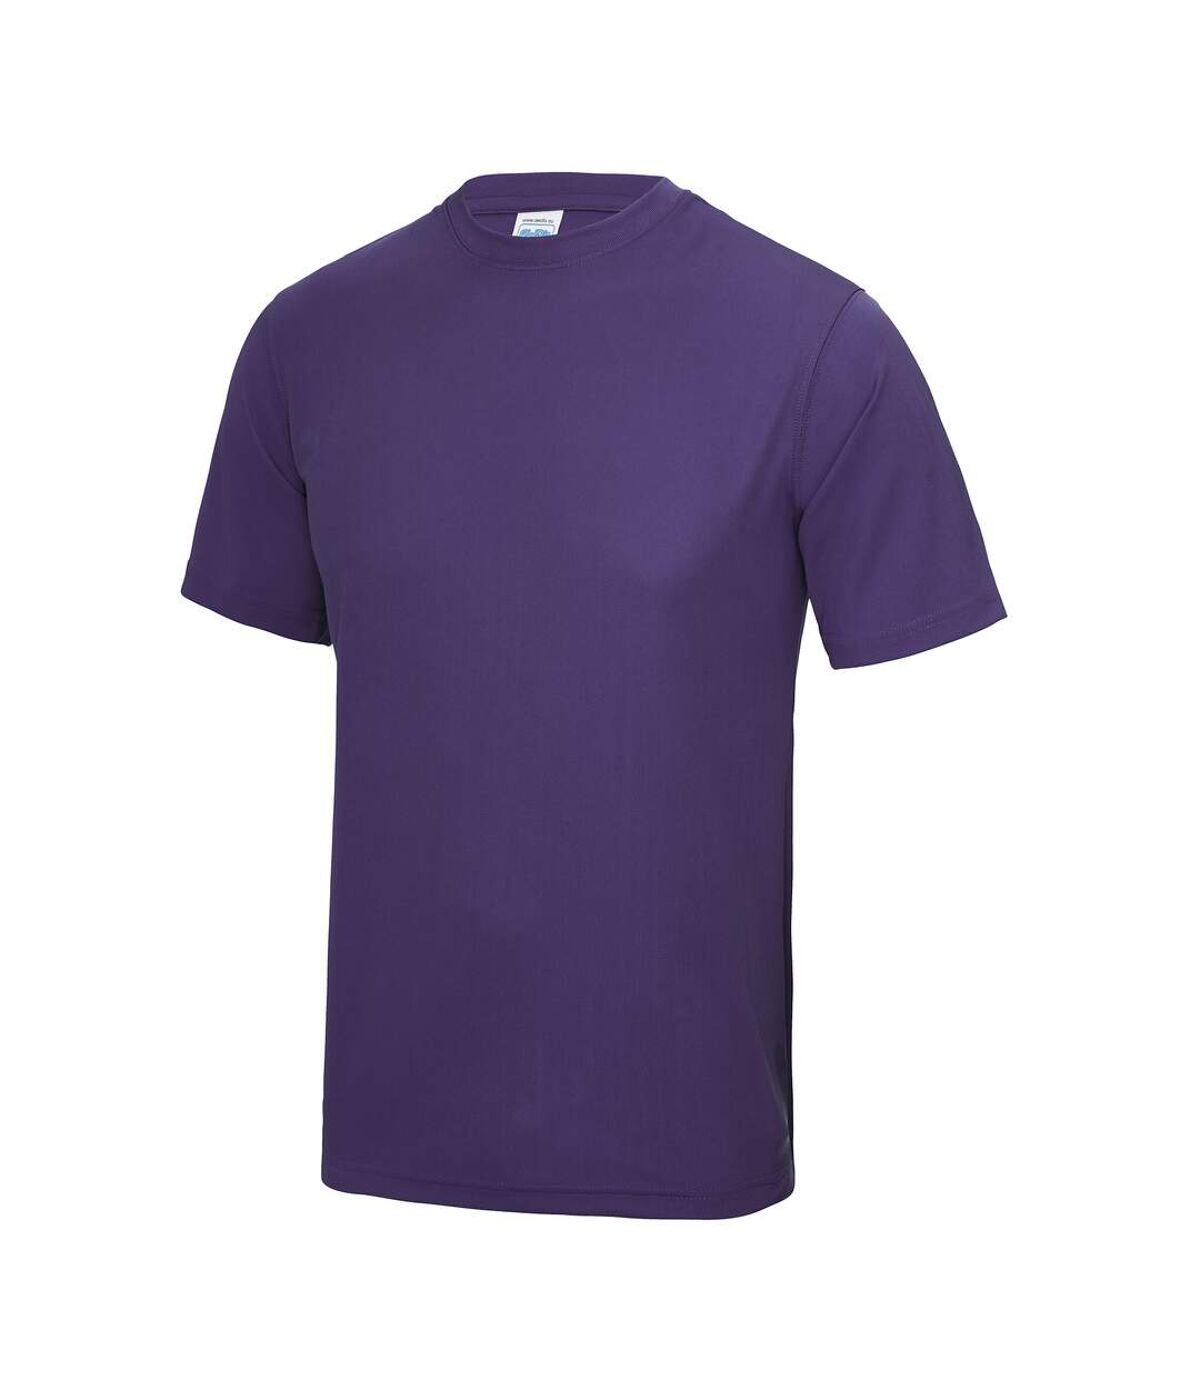 AWDis Just Cool Mens Performance Plain T-Shirt (Red hot Chilli) - UTRW683